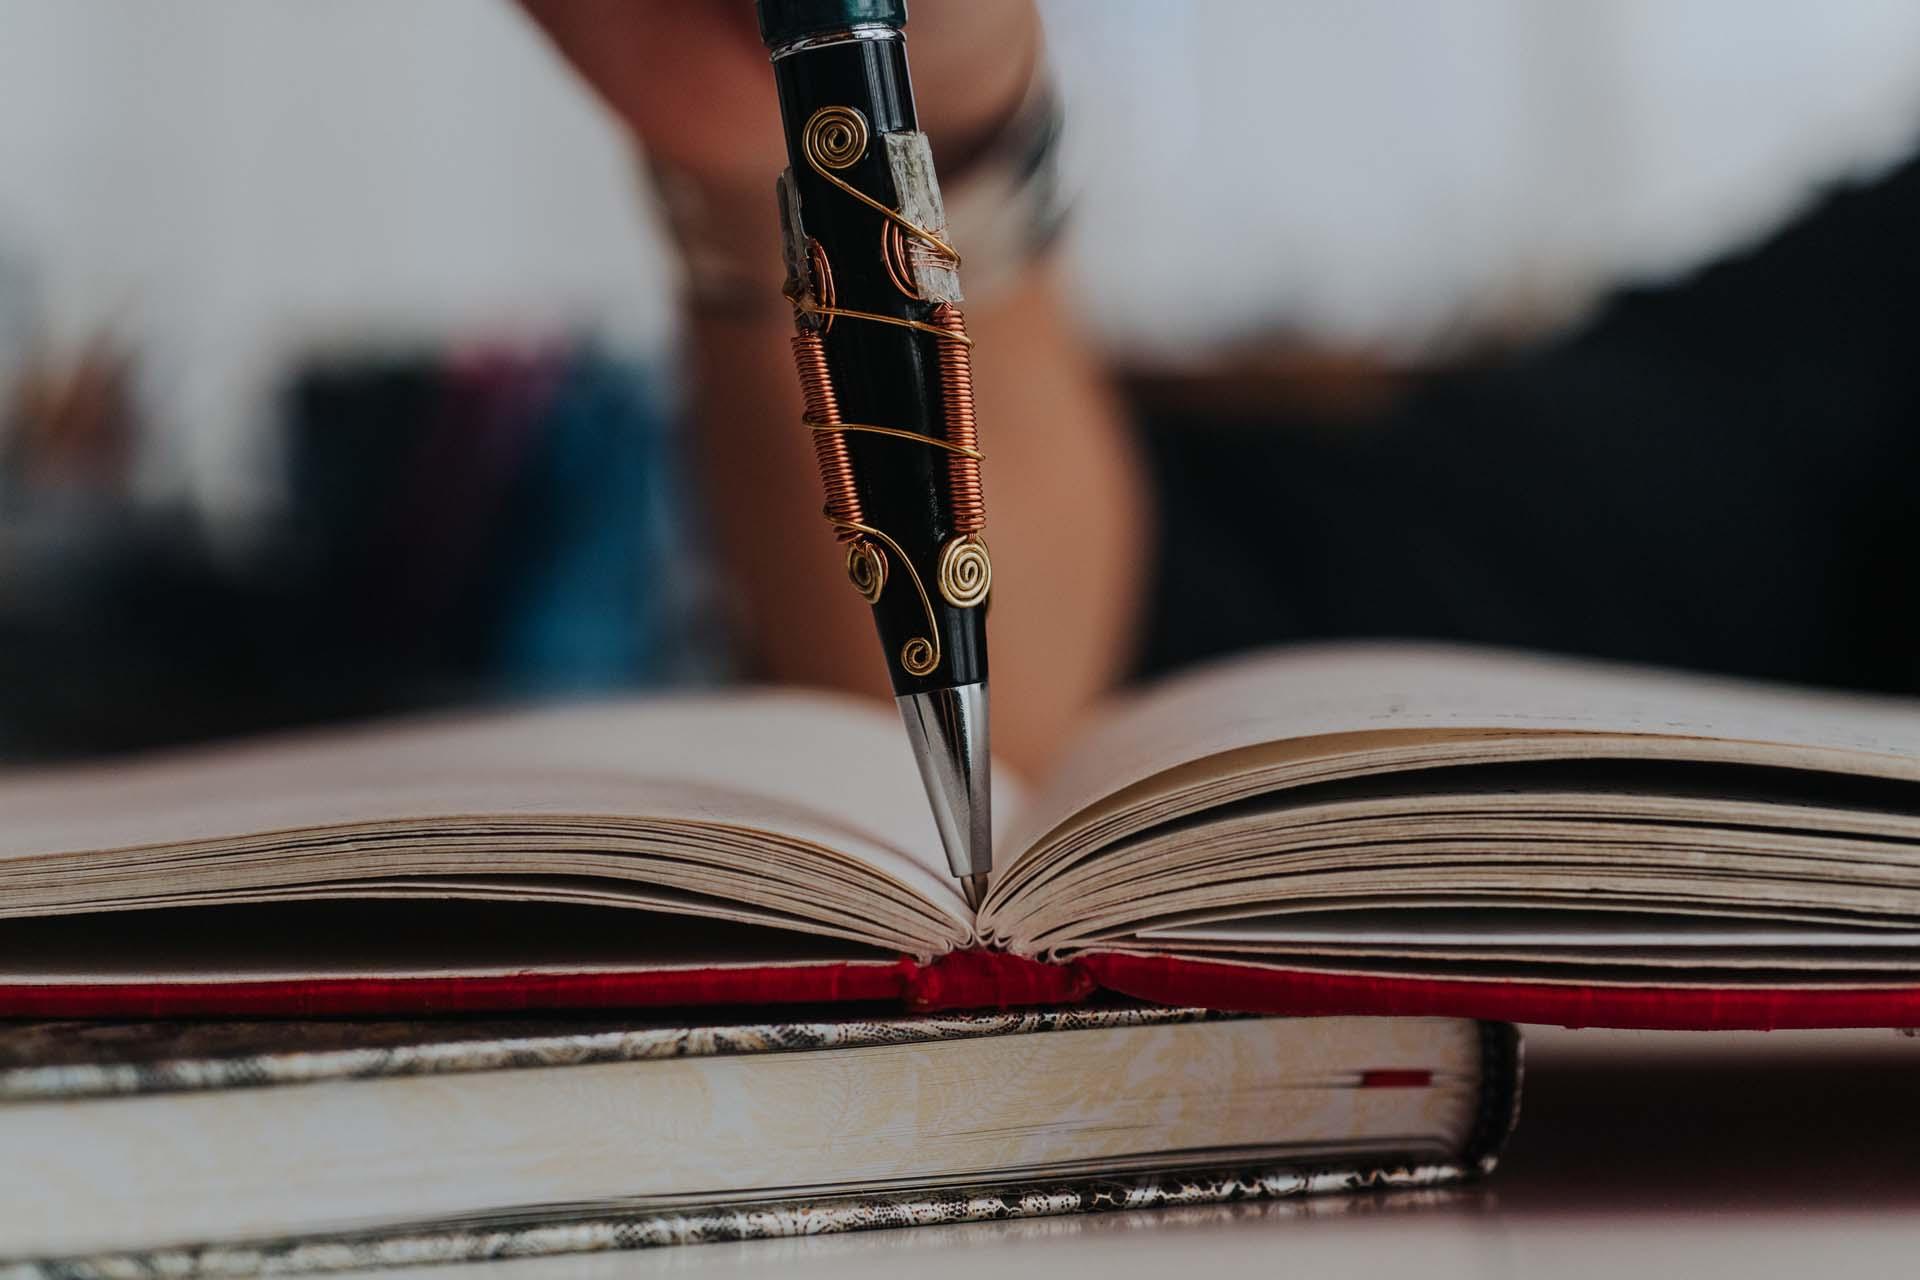 La scrittura automatica è una porta per satana